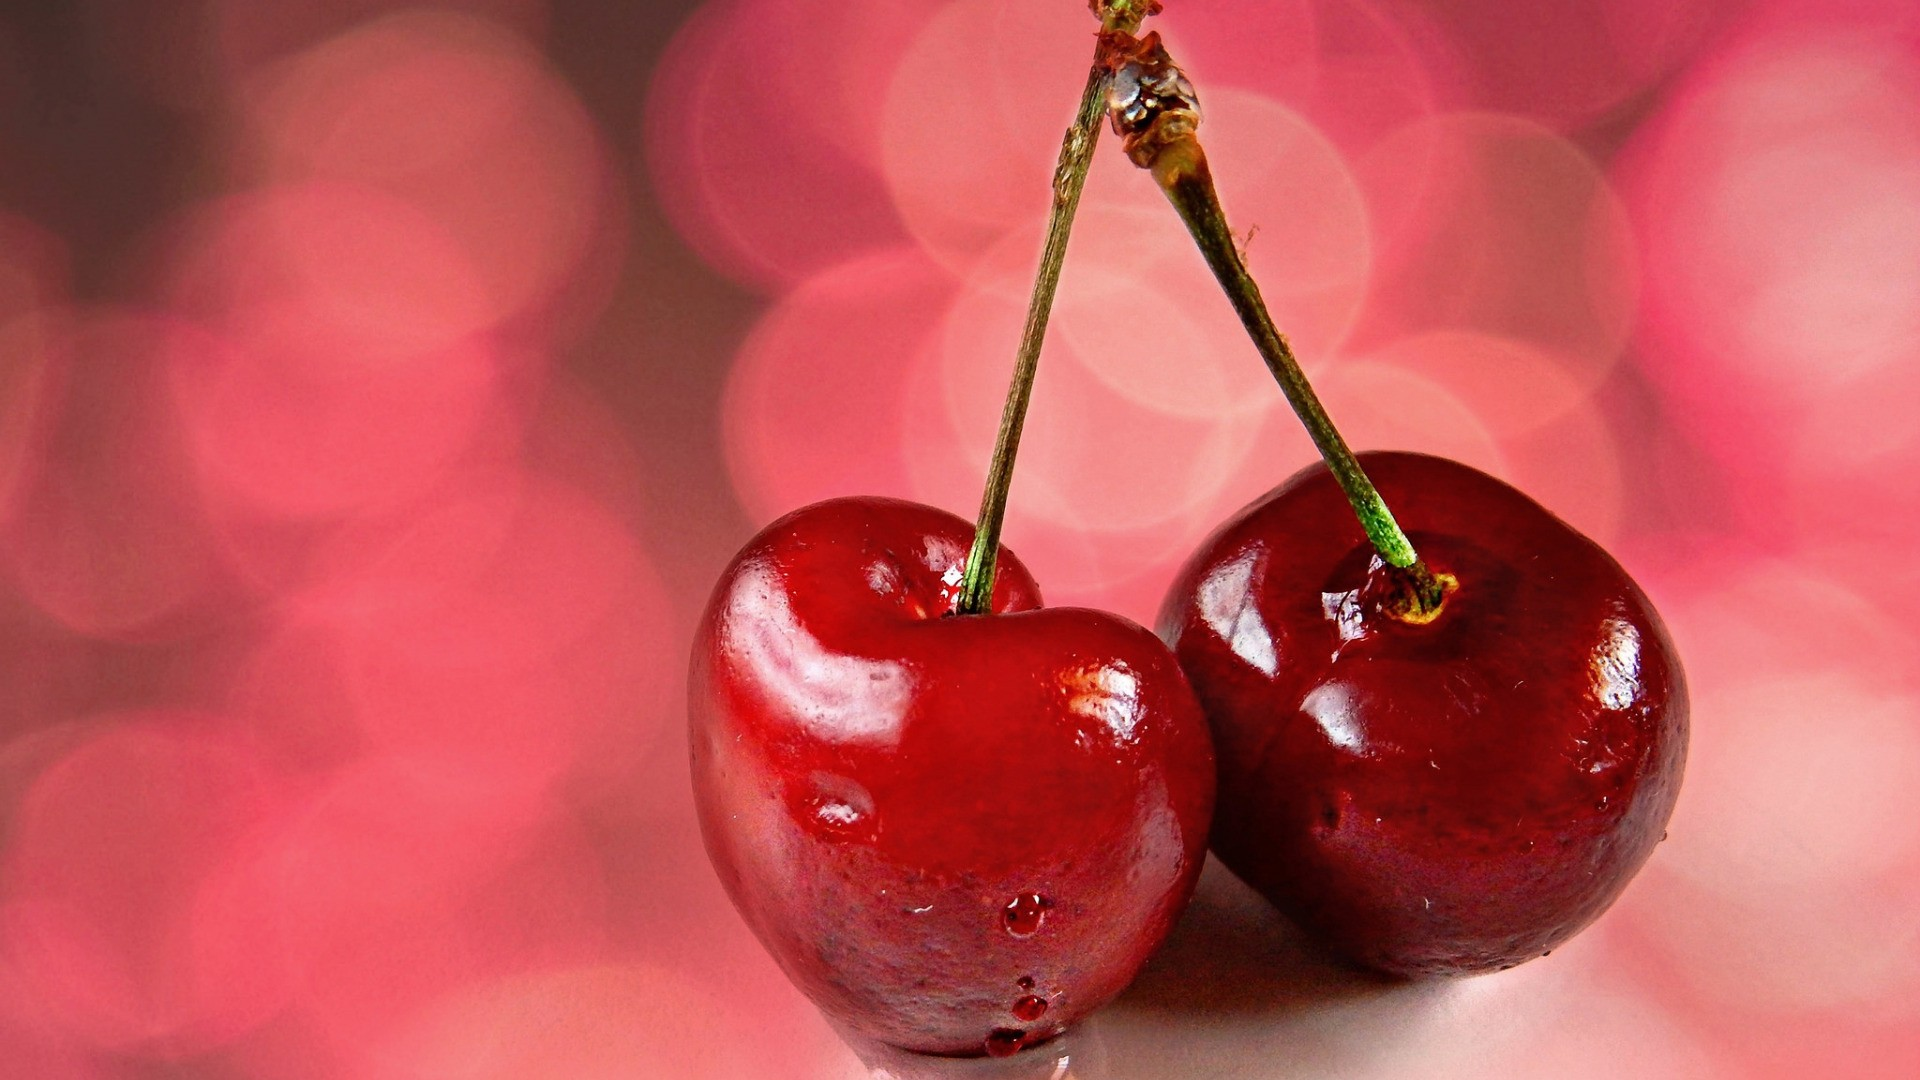 Cherry Wallpaper image hd